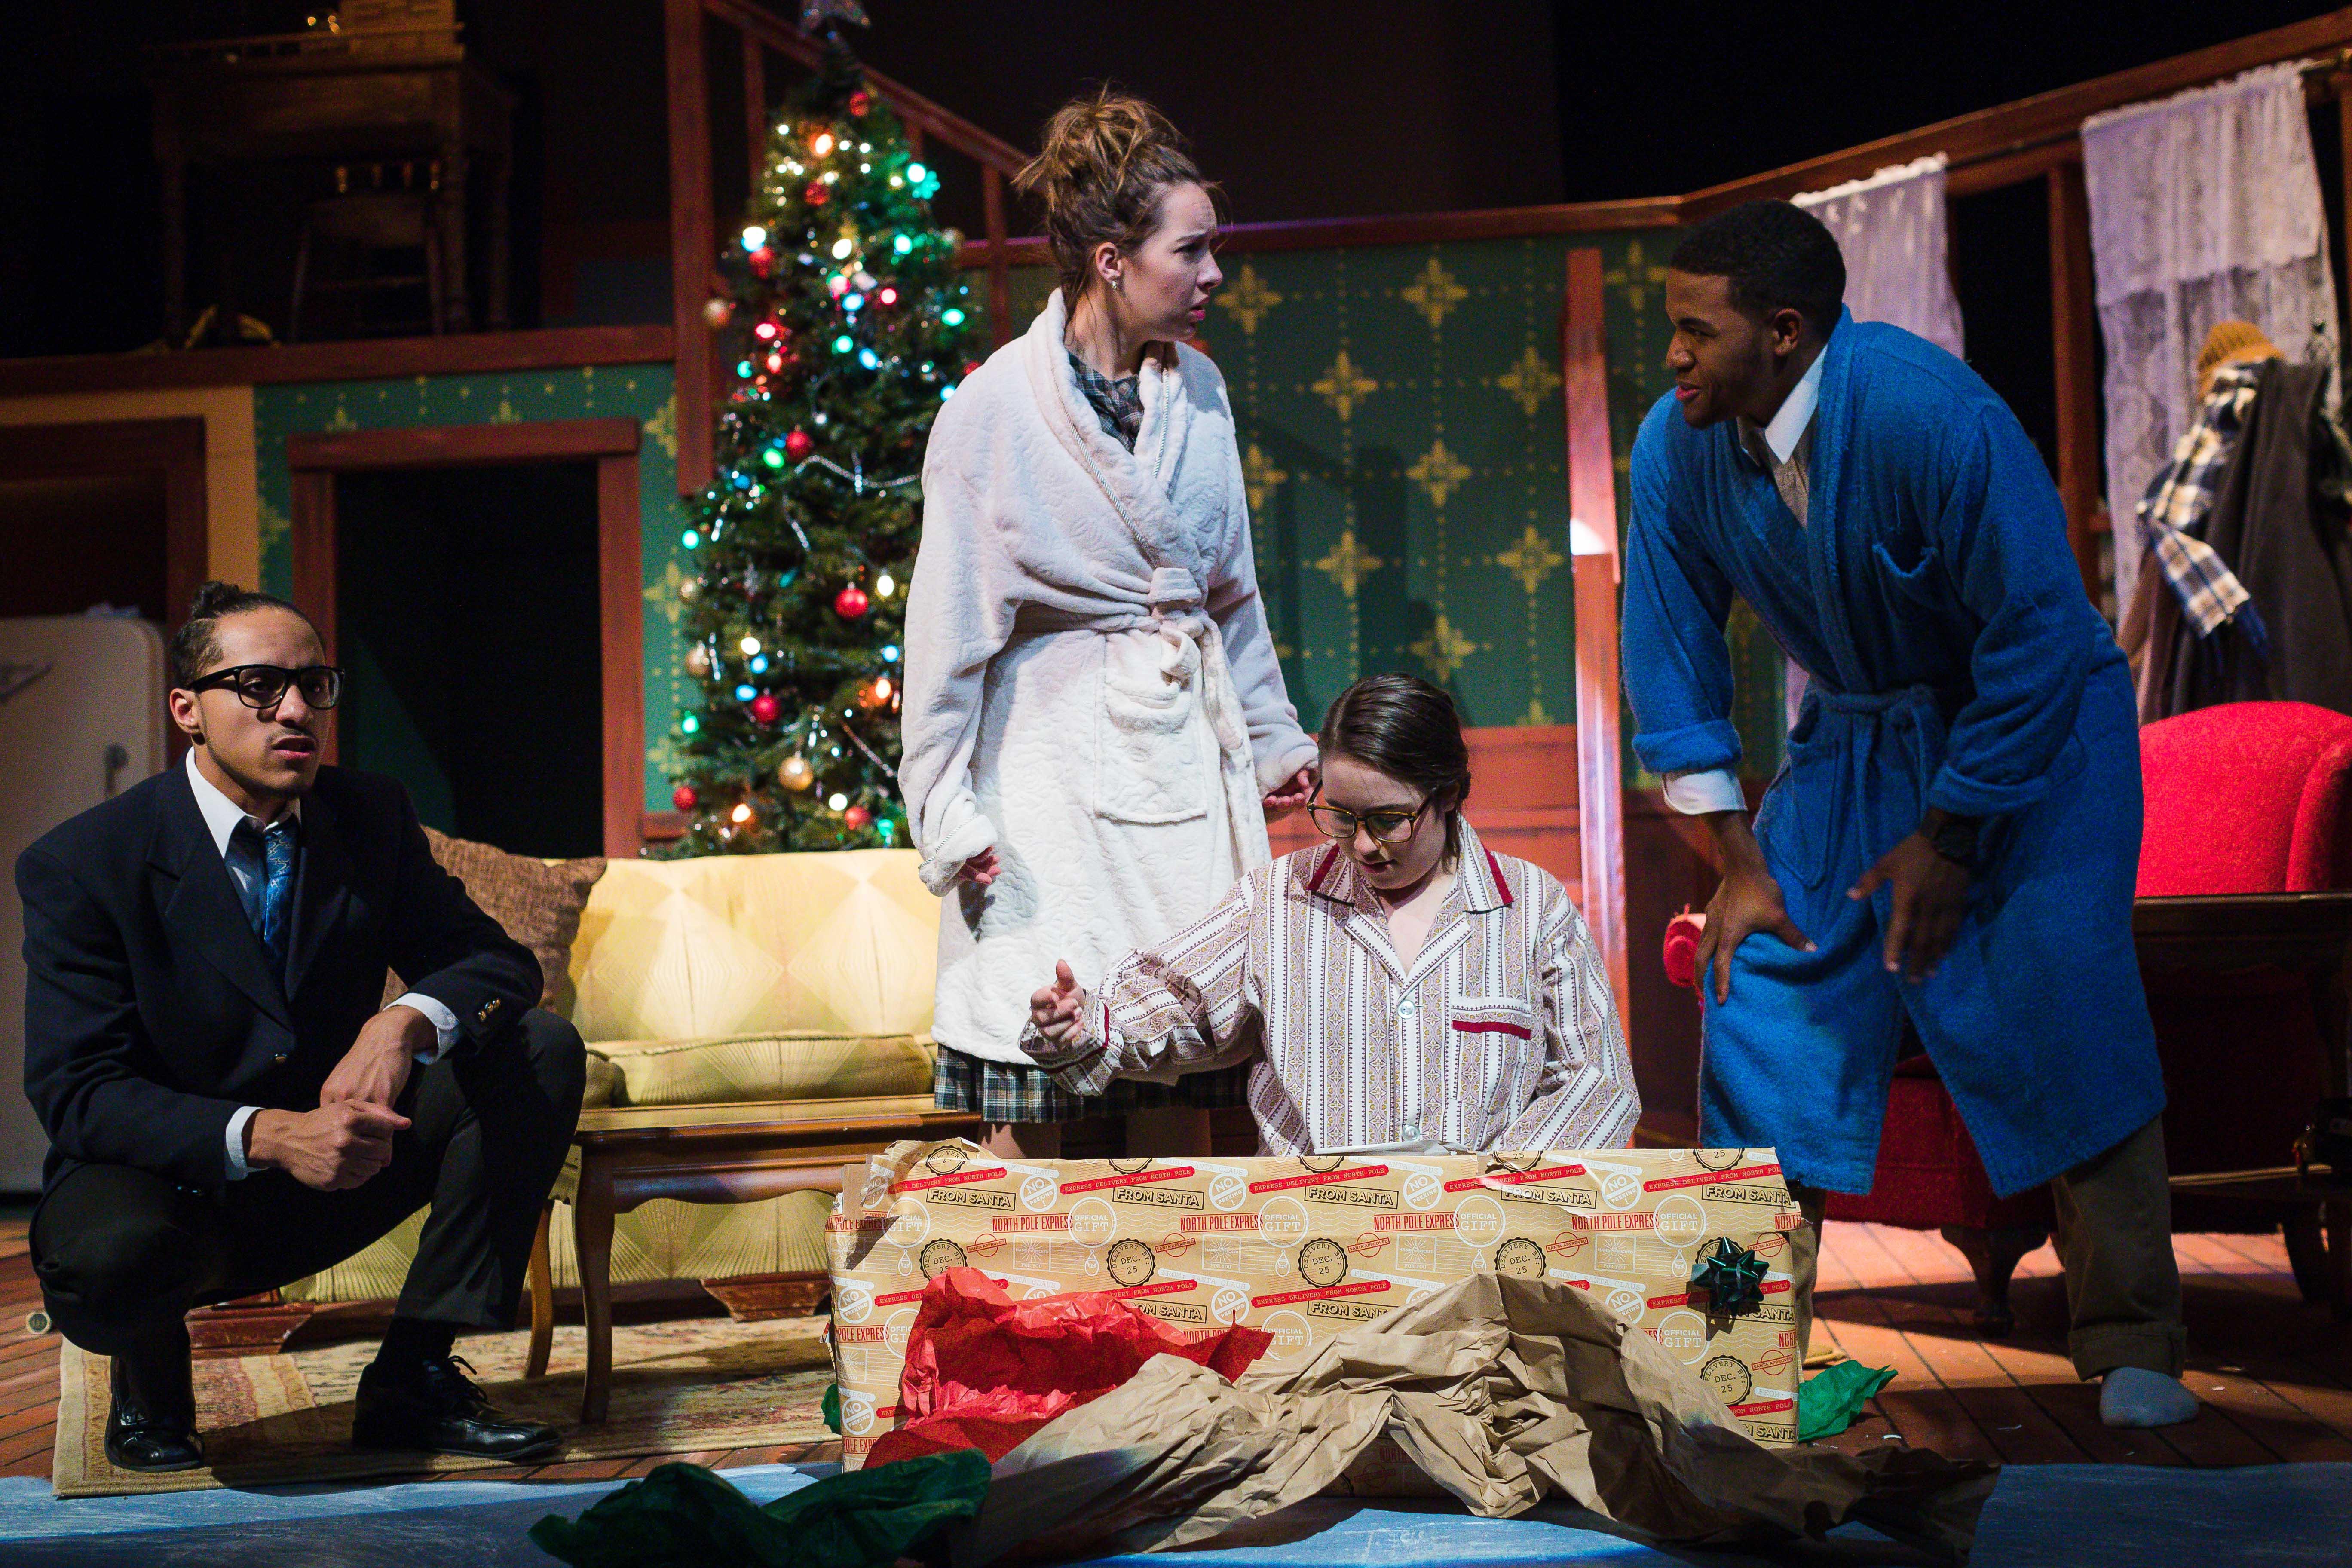 Weaver_Christmasshoot-_MG_1562